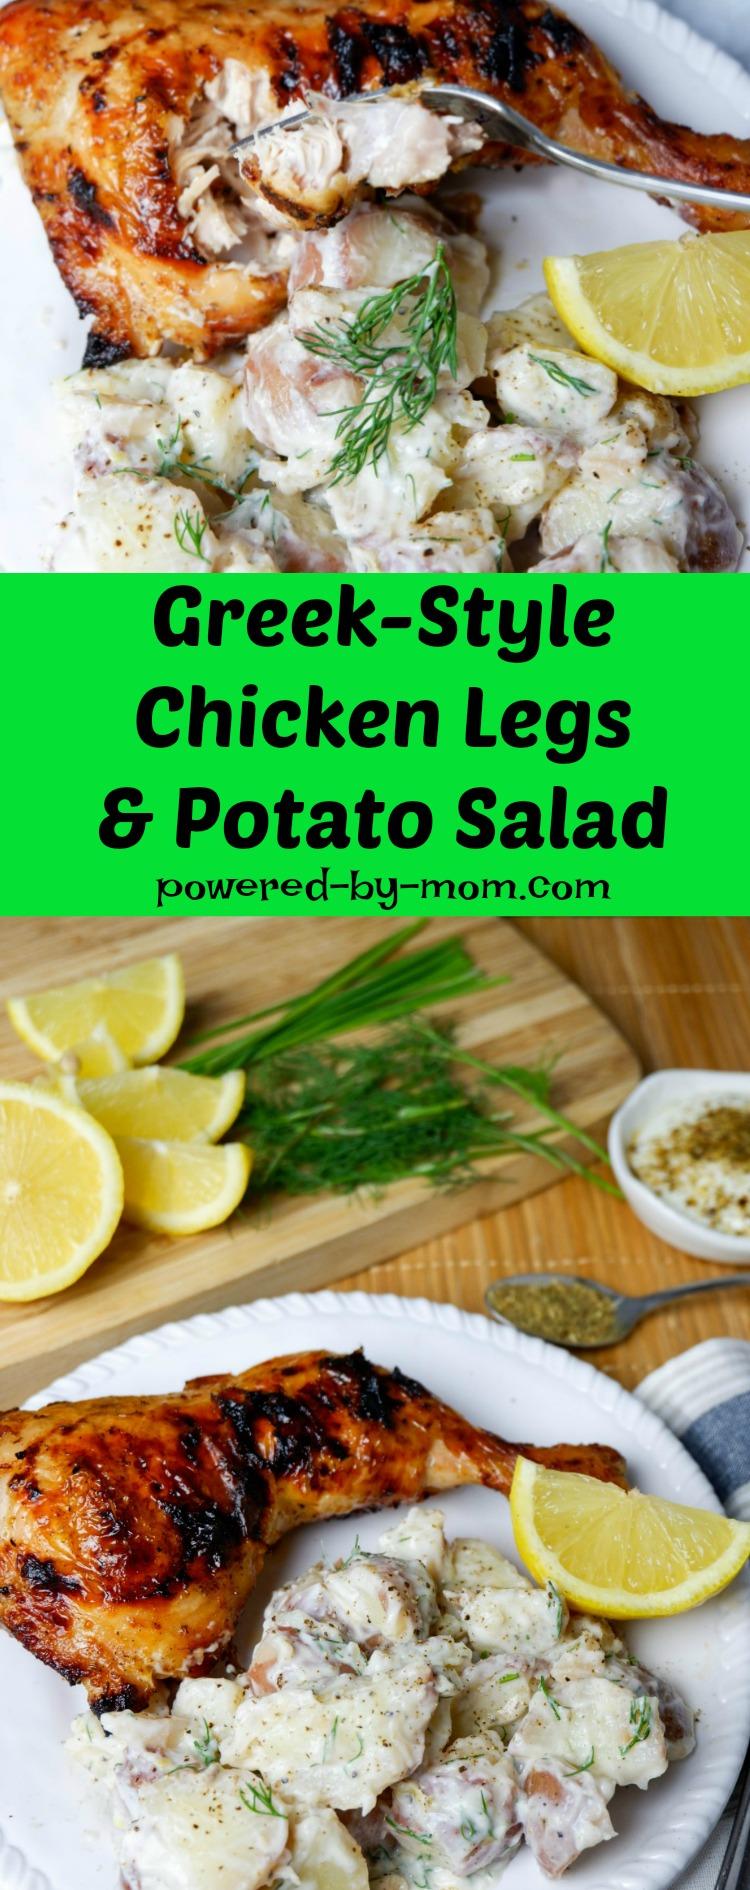 Greek-Style Chicken Legs and Potato Salad Recipe